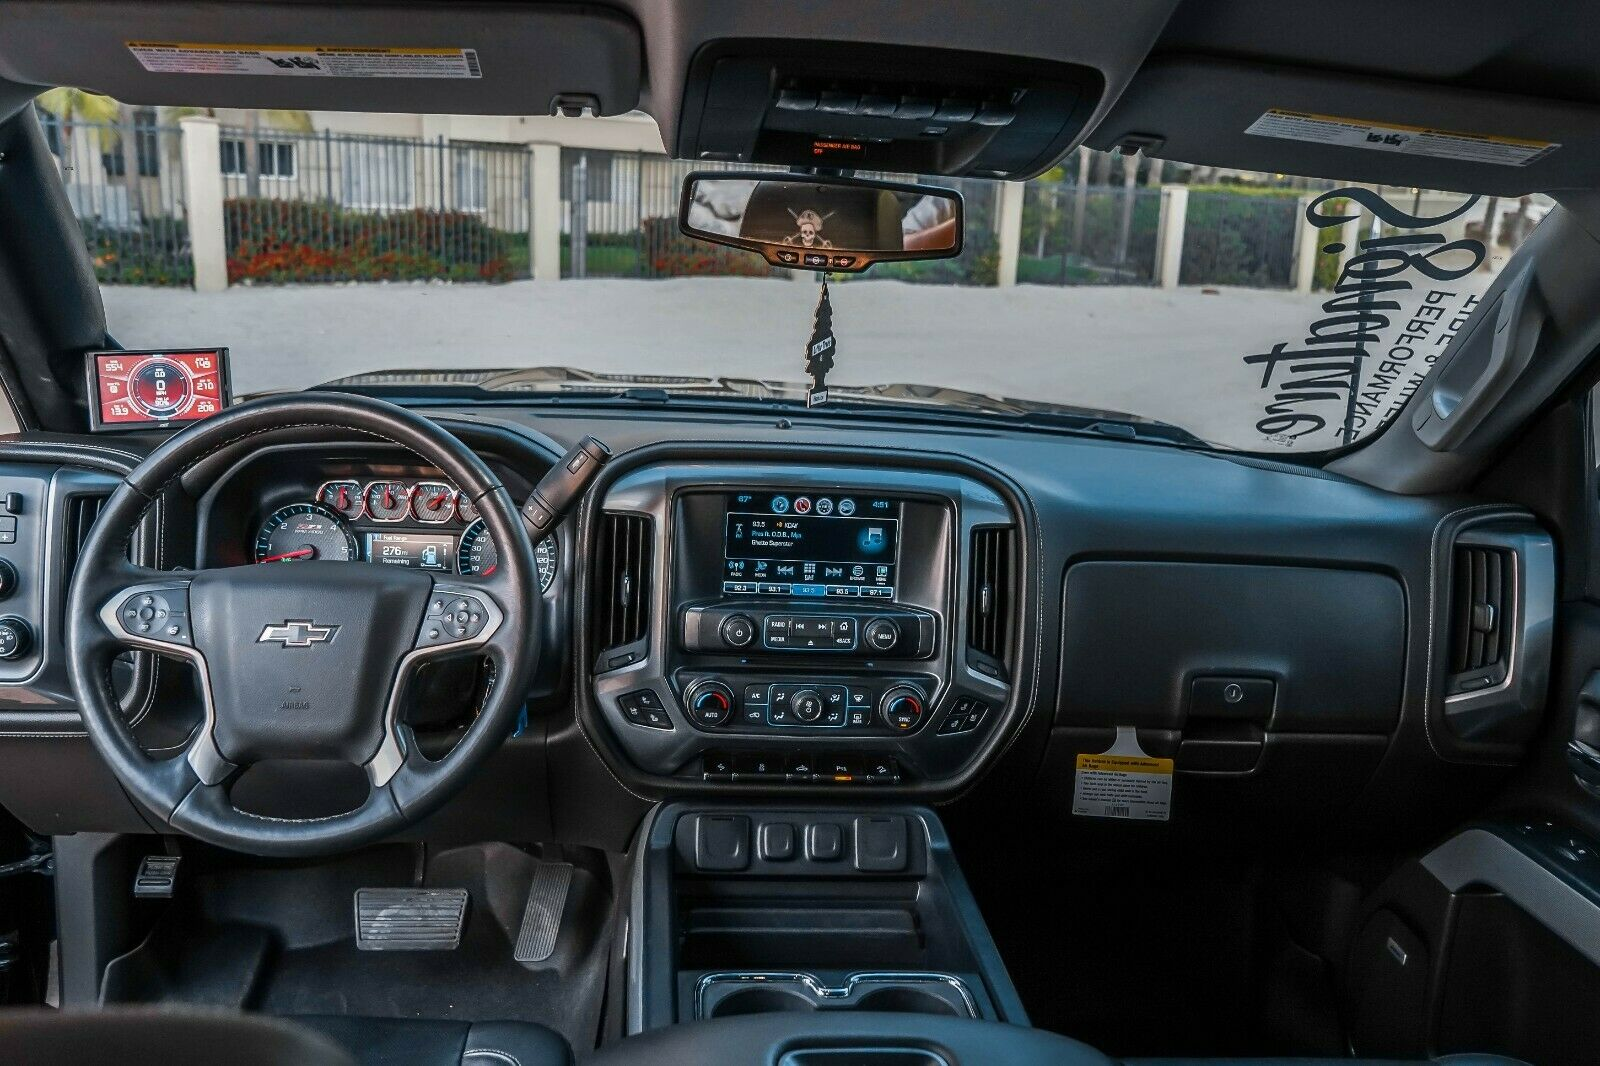 fully loaded 2017 Chevrolet Silverado 1500 LTZ Z71 Midnight Edition 6.2L lifted